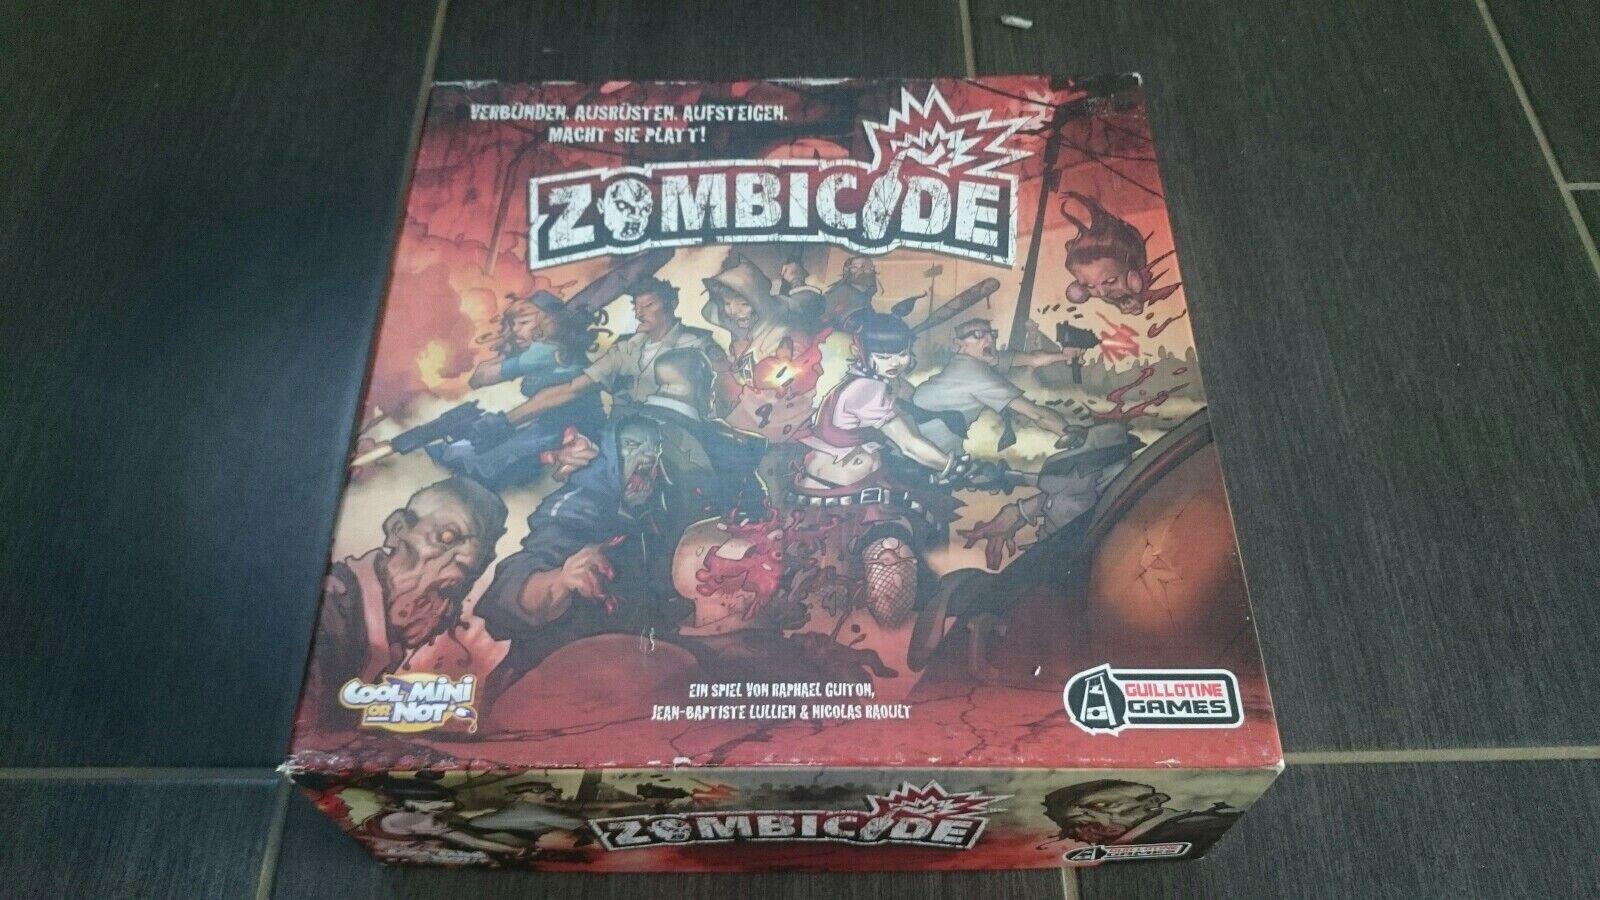 Jóvenes Asmodee Cool mini or not Zombicide juego de mesa juguete Game para Family